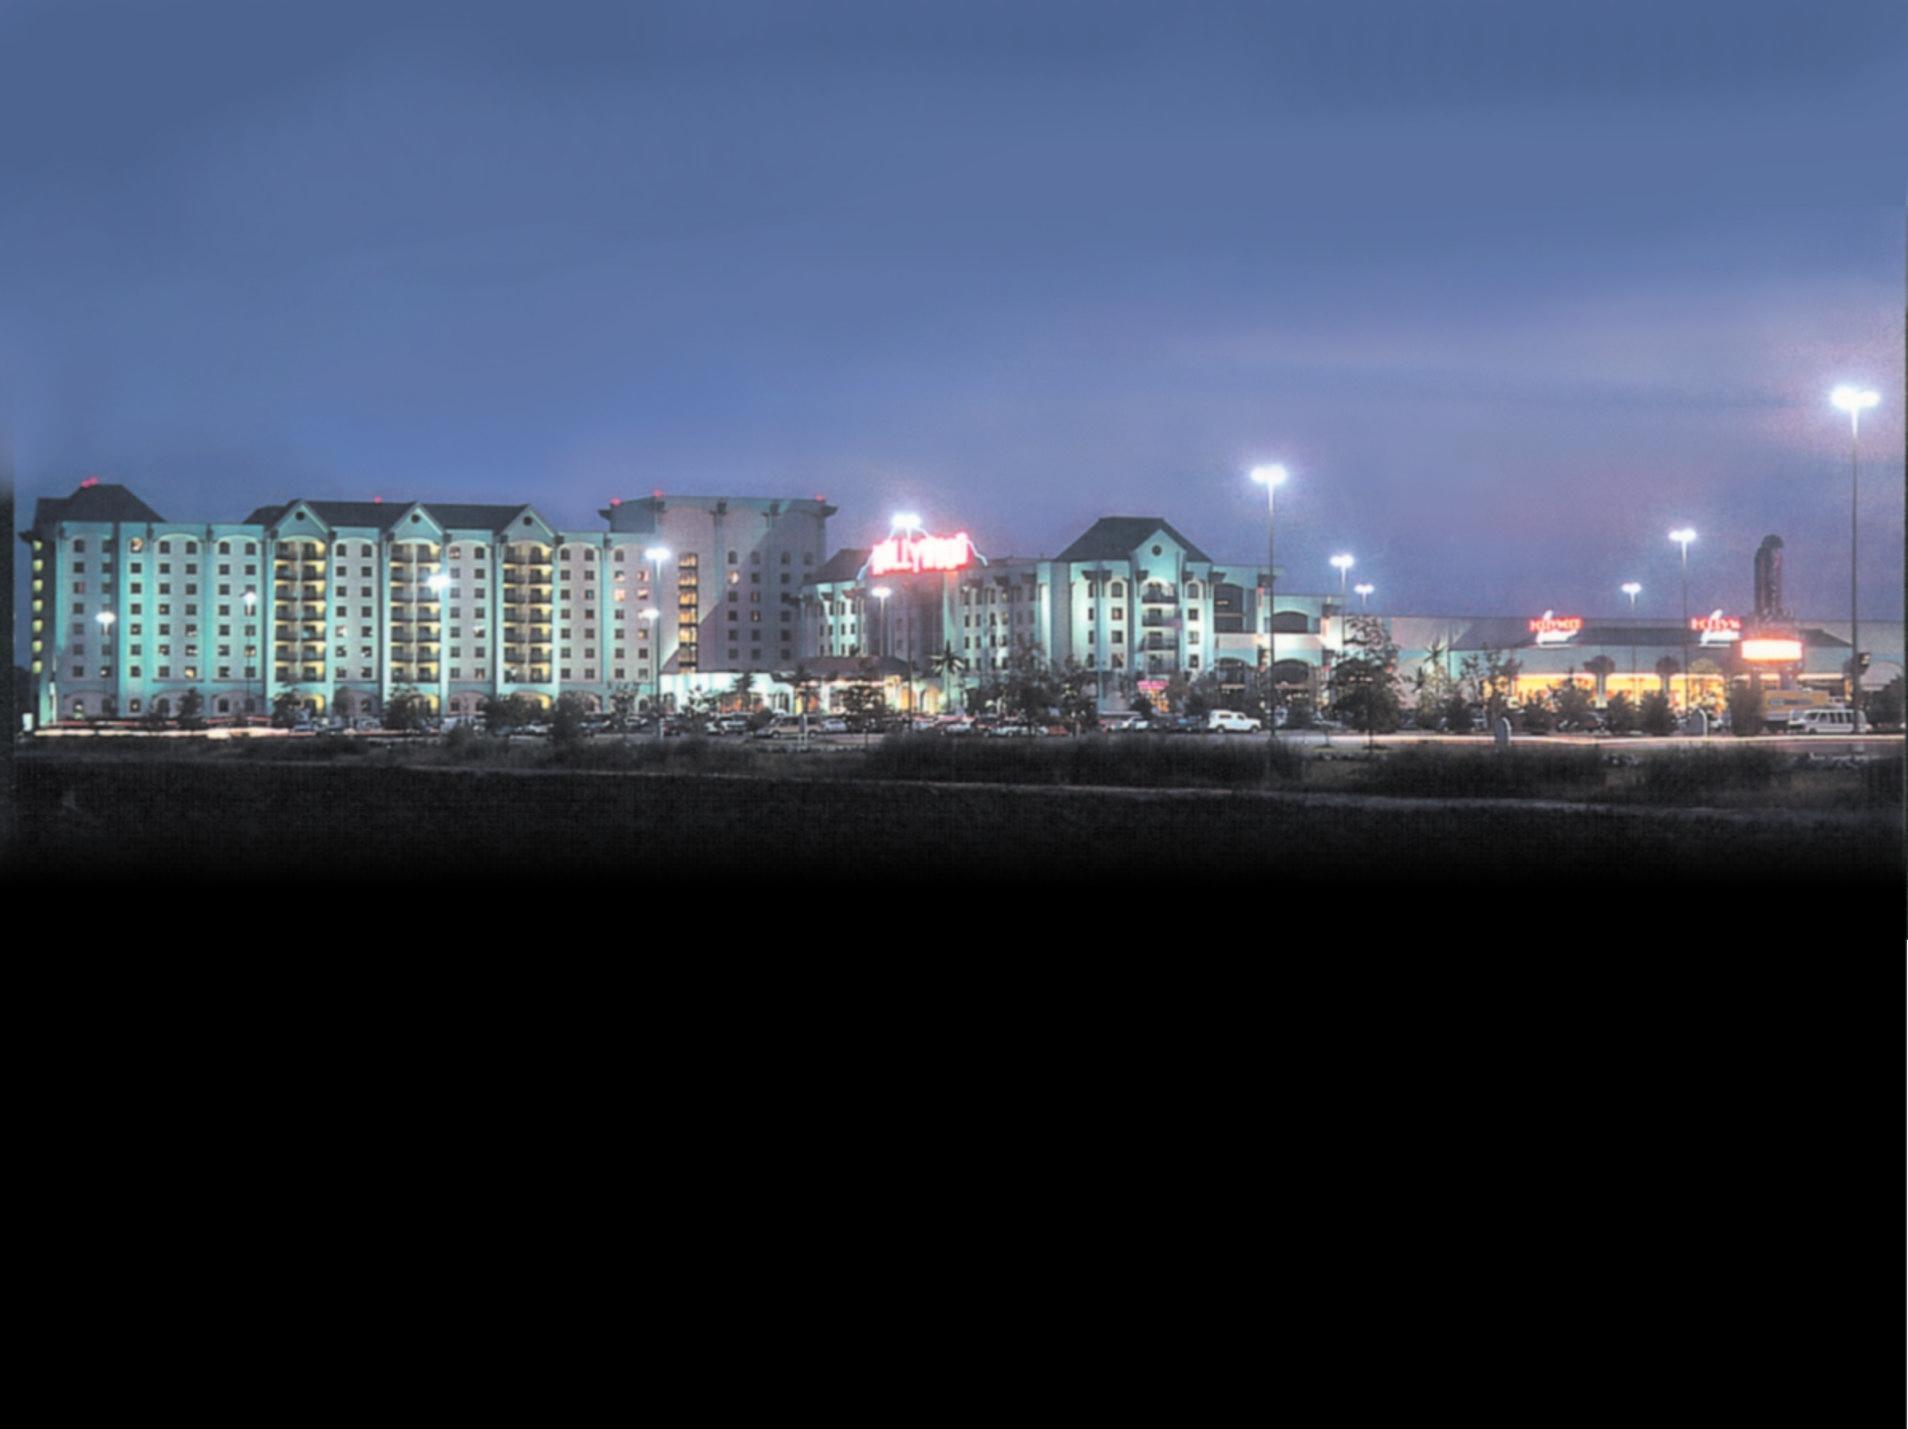 Hollywood Casino Tunica Hotel